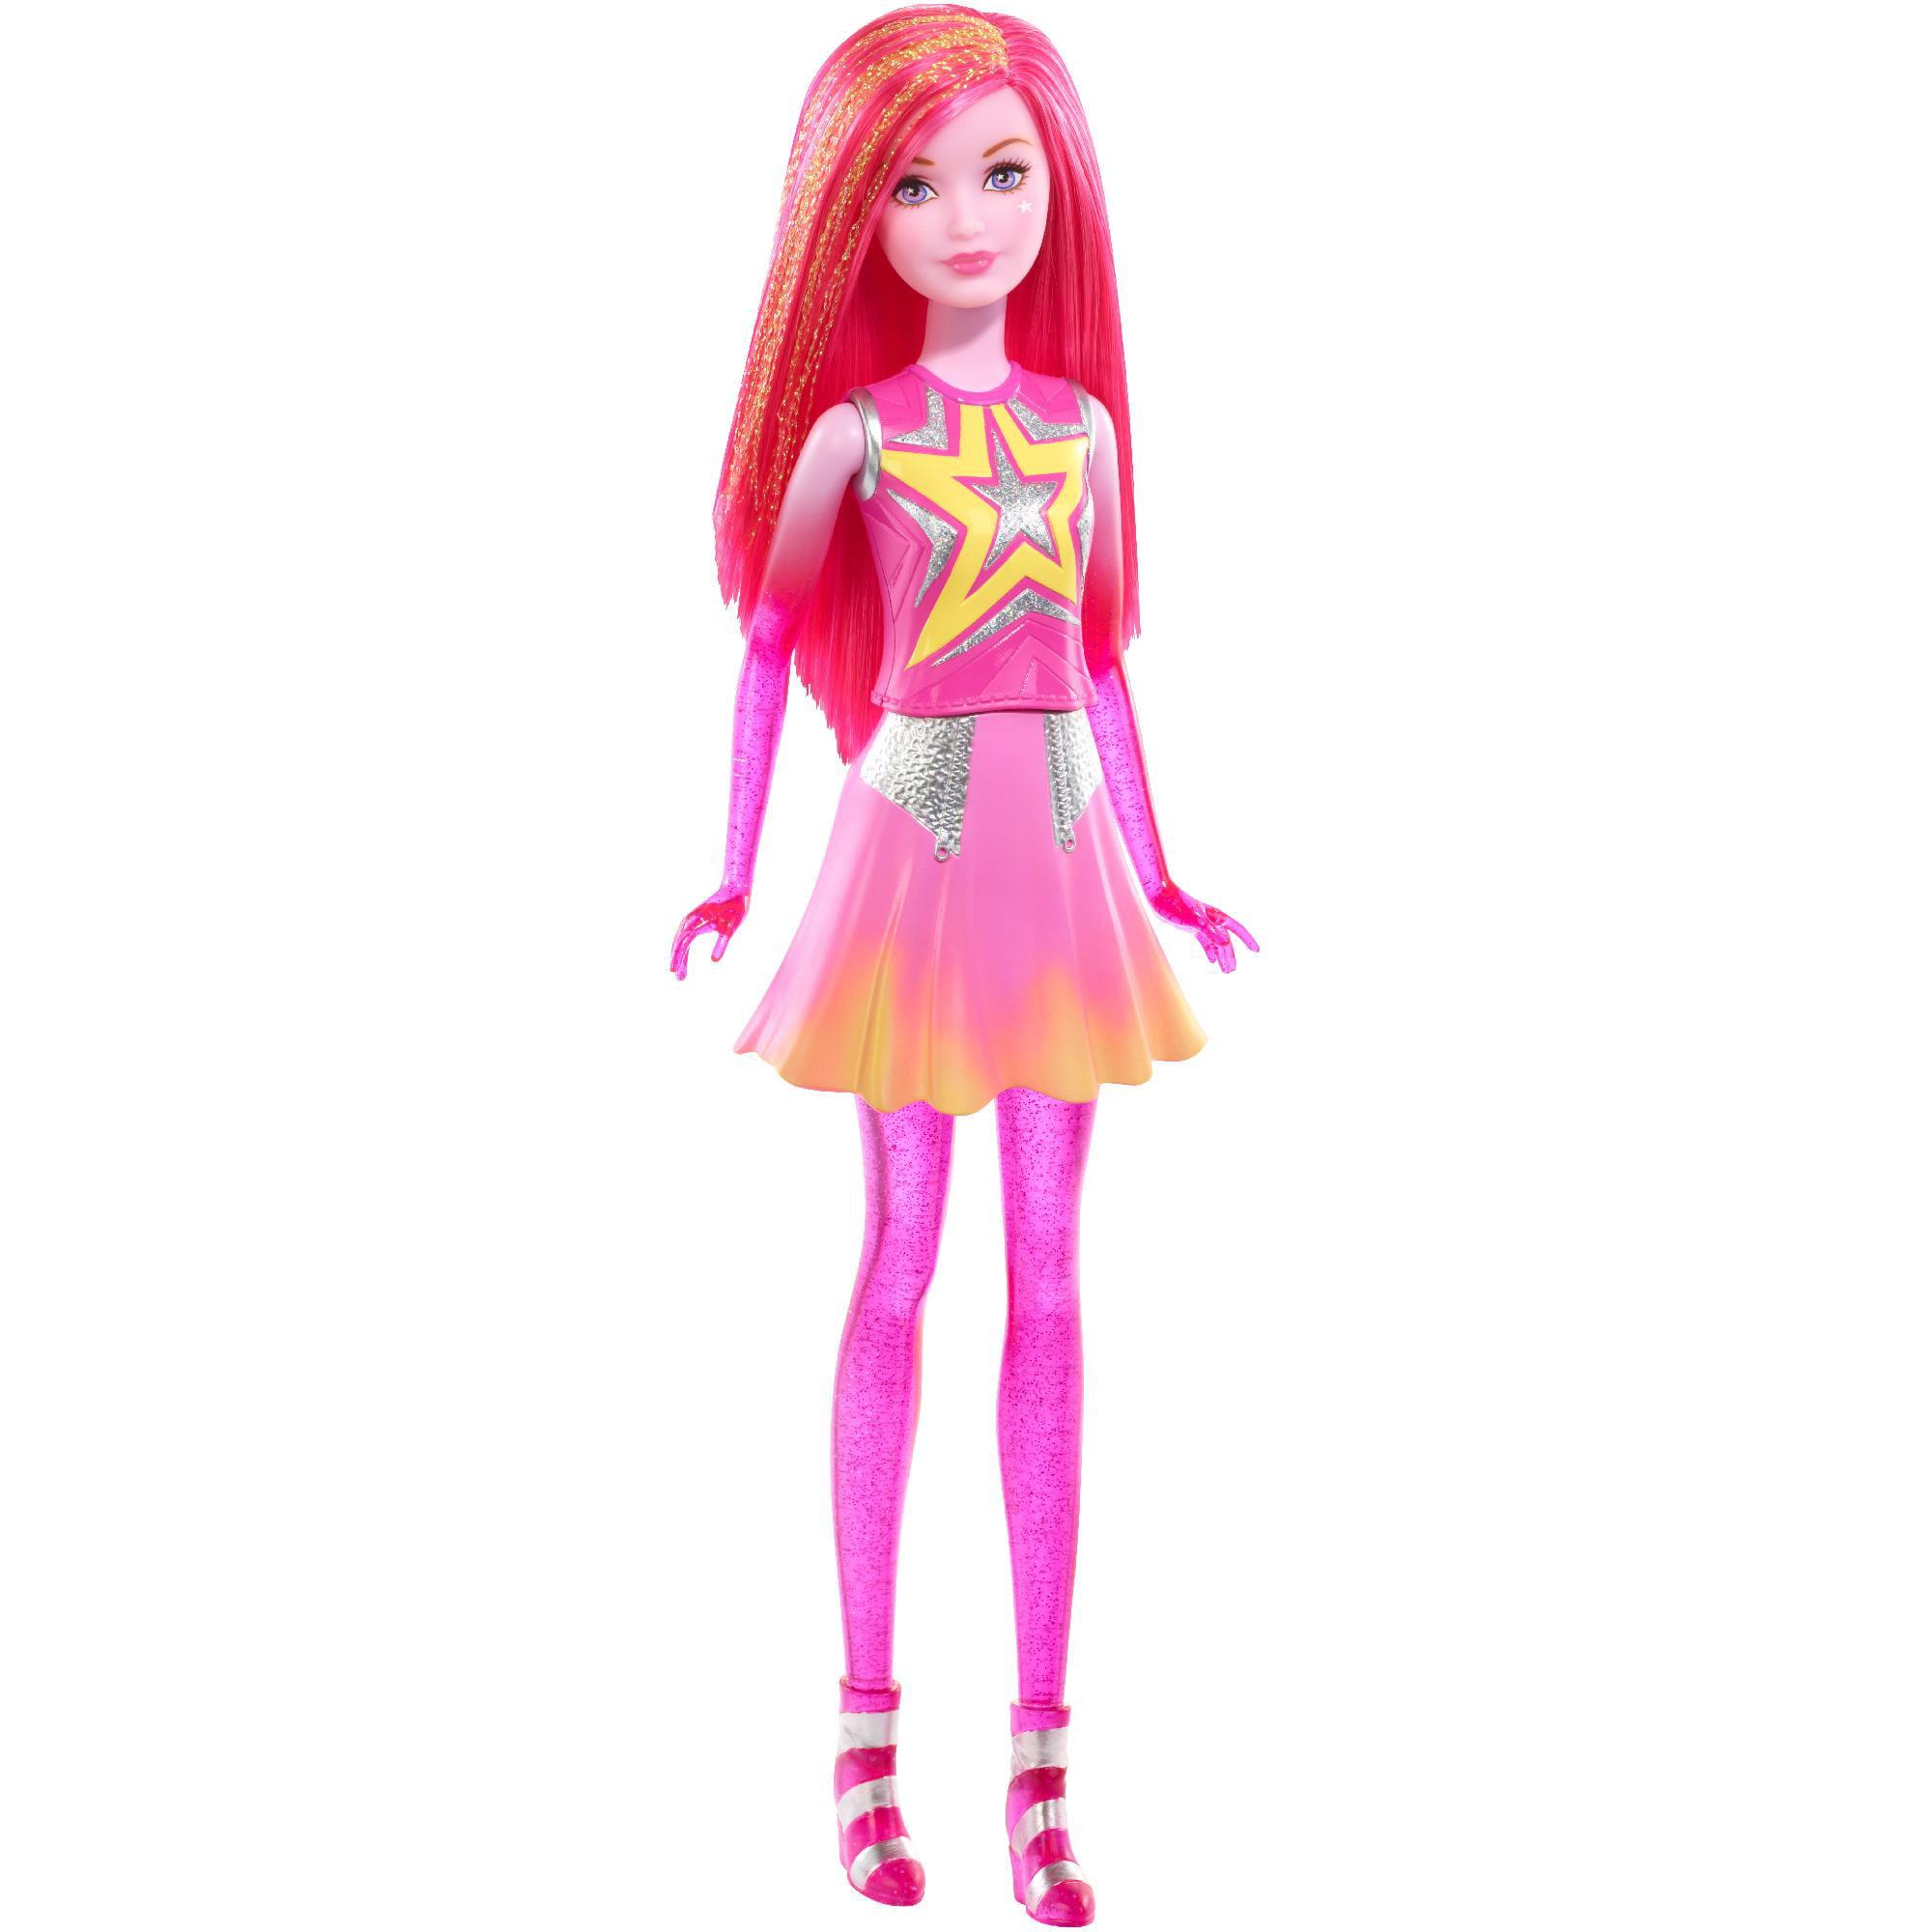 barbie star light adventure pink space twin doll walmartcom